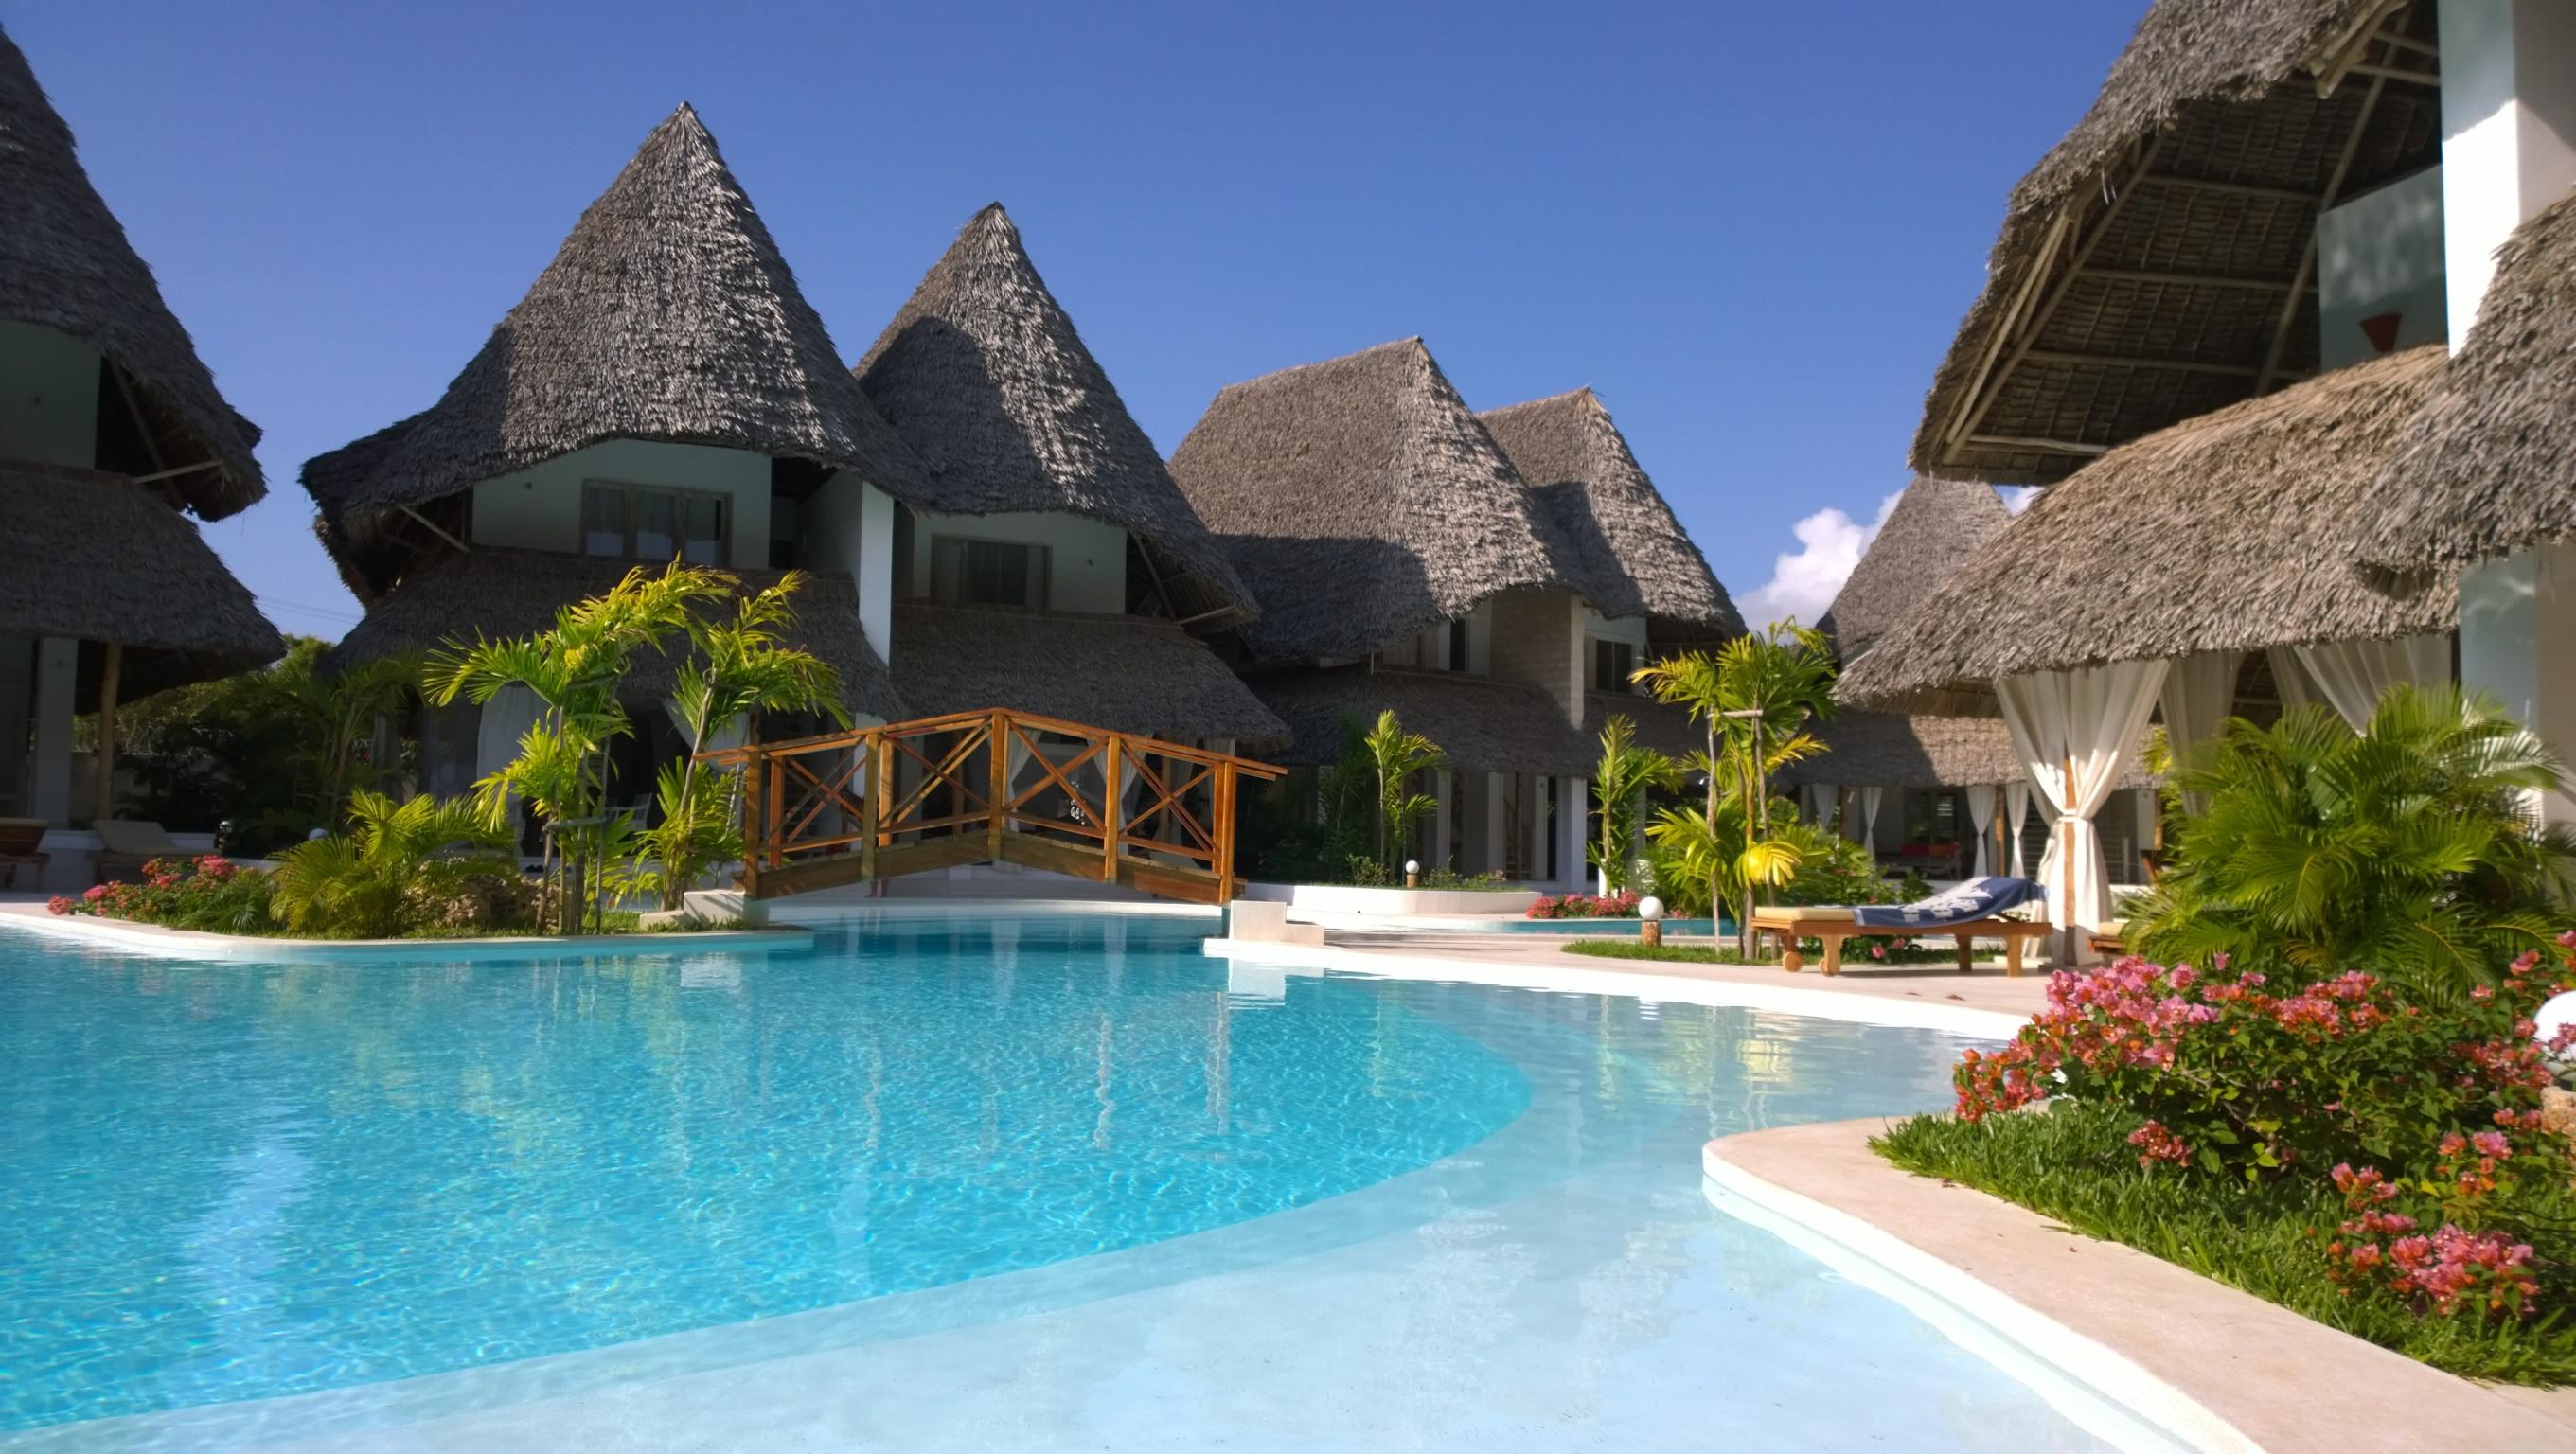 2 Bedrooms House For Rent For Sale Terraced House Malindi Malindi Kenya Marlin